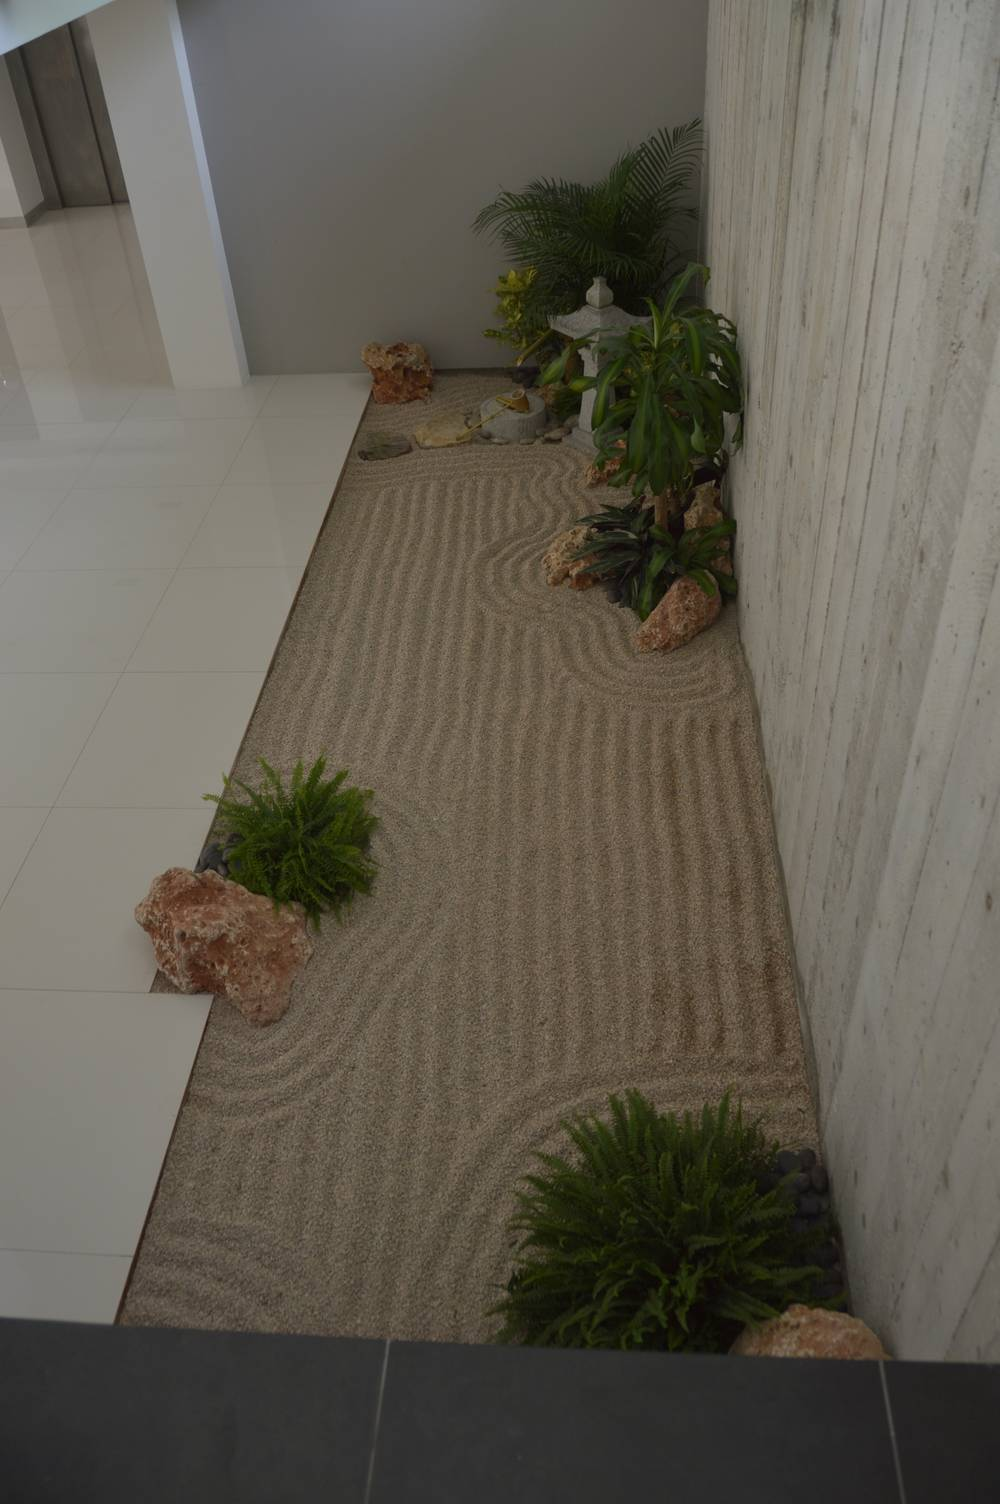 jardin interieur zen deco with jardin interieur zen tonnelle de jardin jardiland best of serre. Black Bedroom Furniture Sets. Home Design Ideas